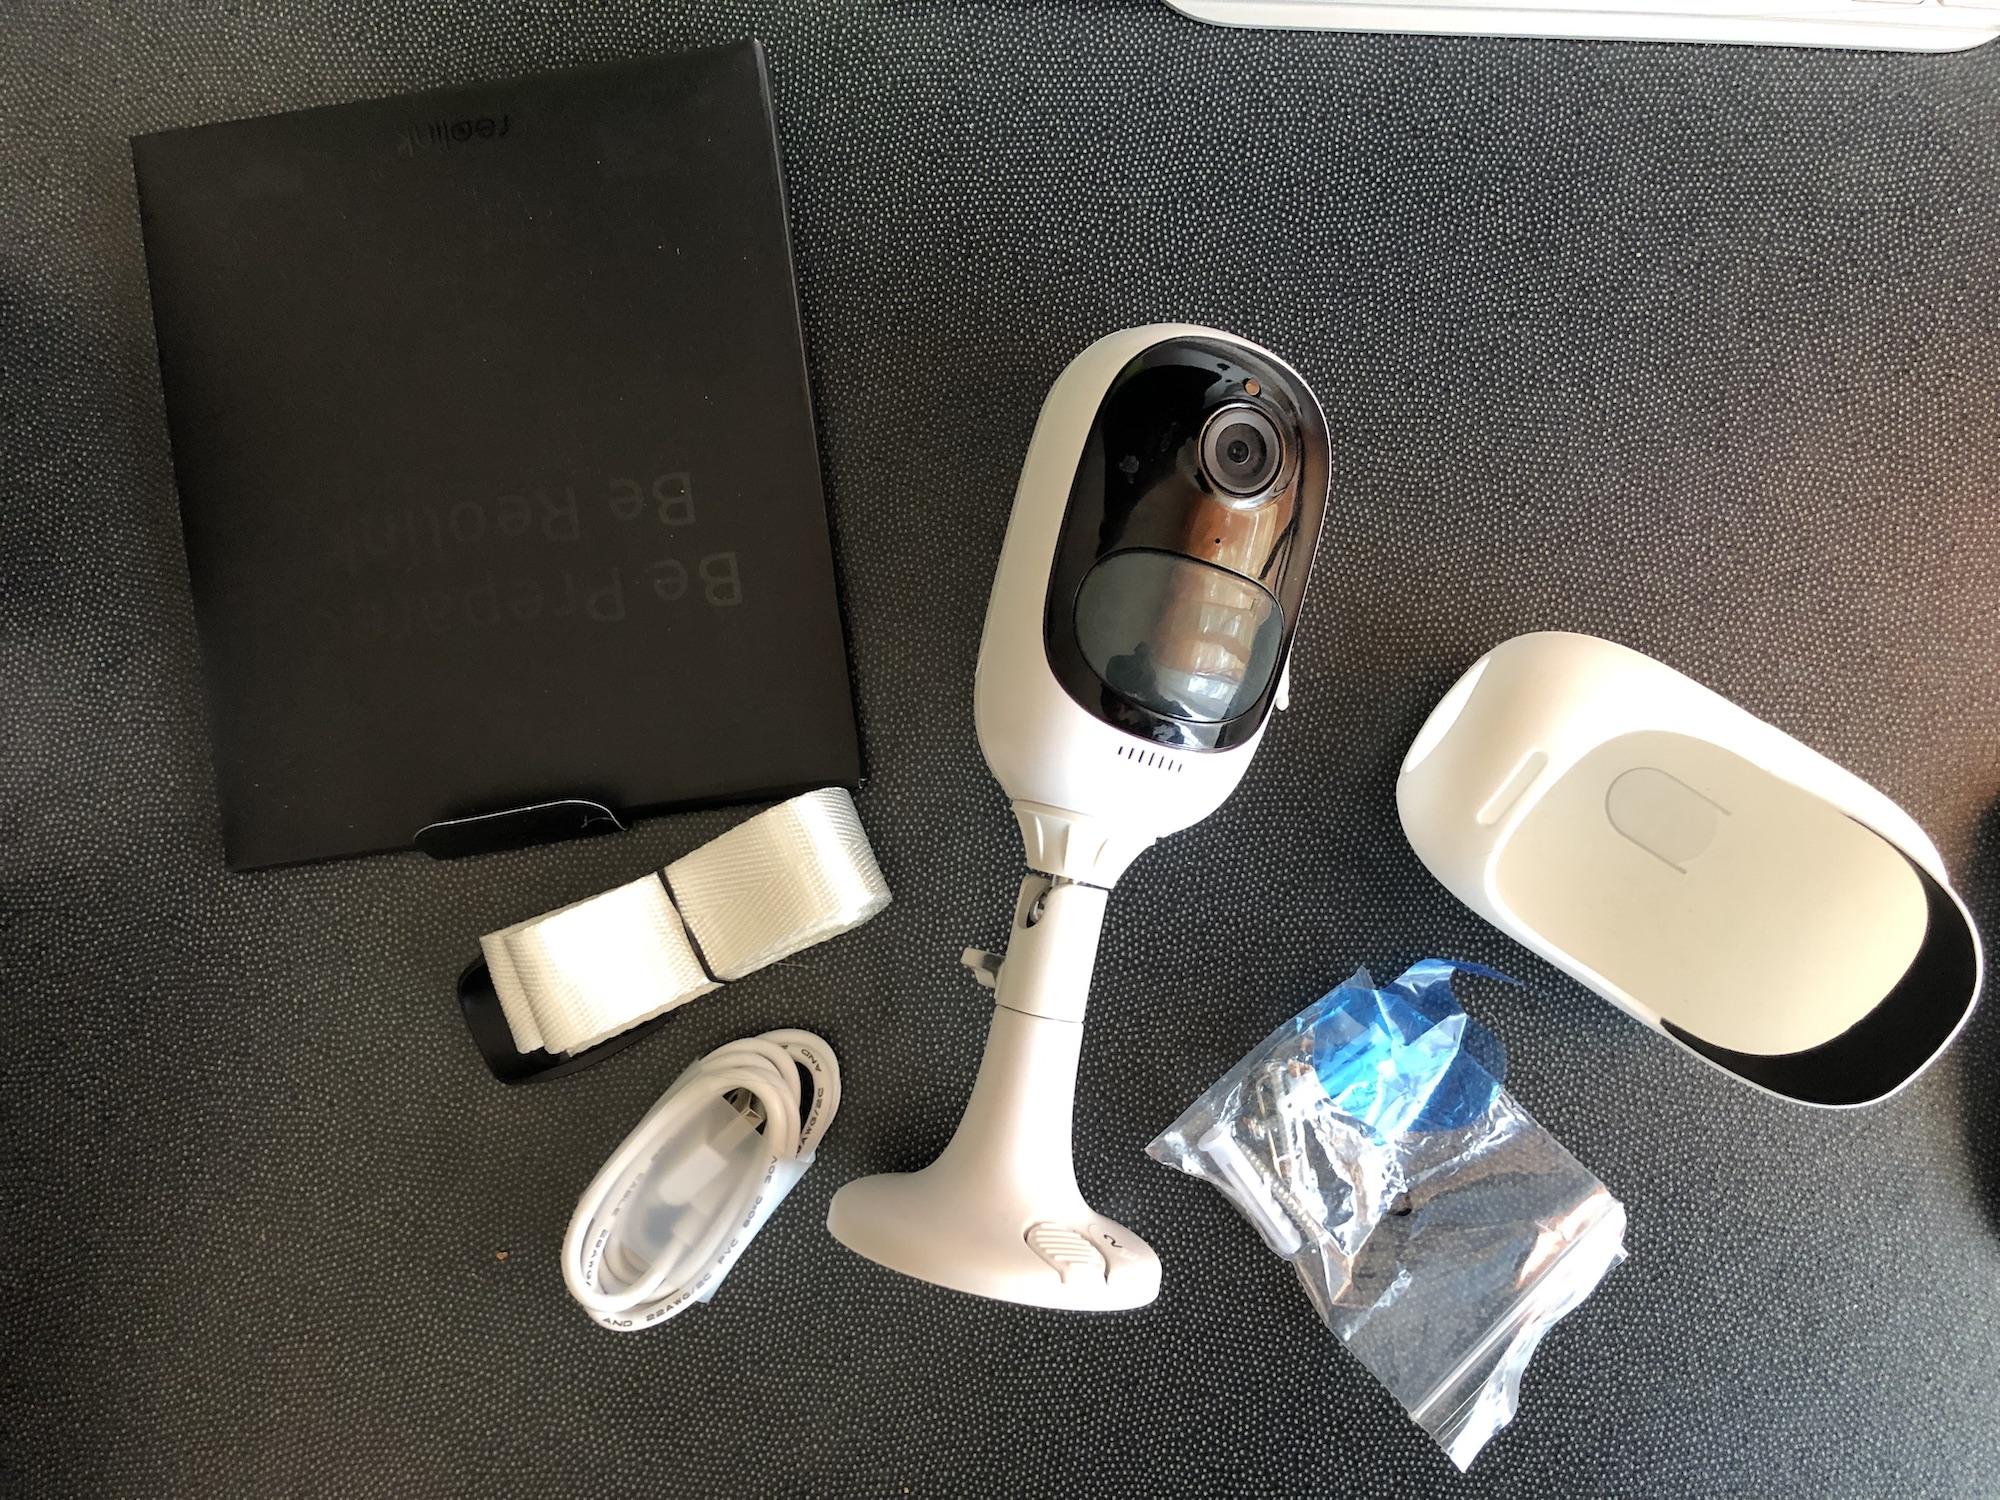 IMG 6013 - Recenzia: Bezpečnostná kamera Reolink Argus Pro